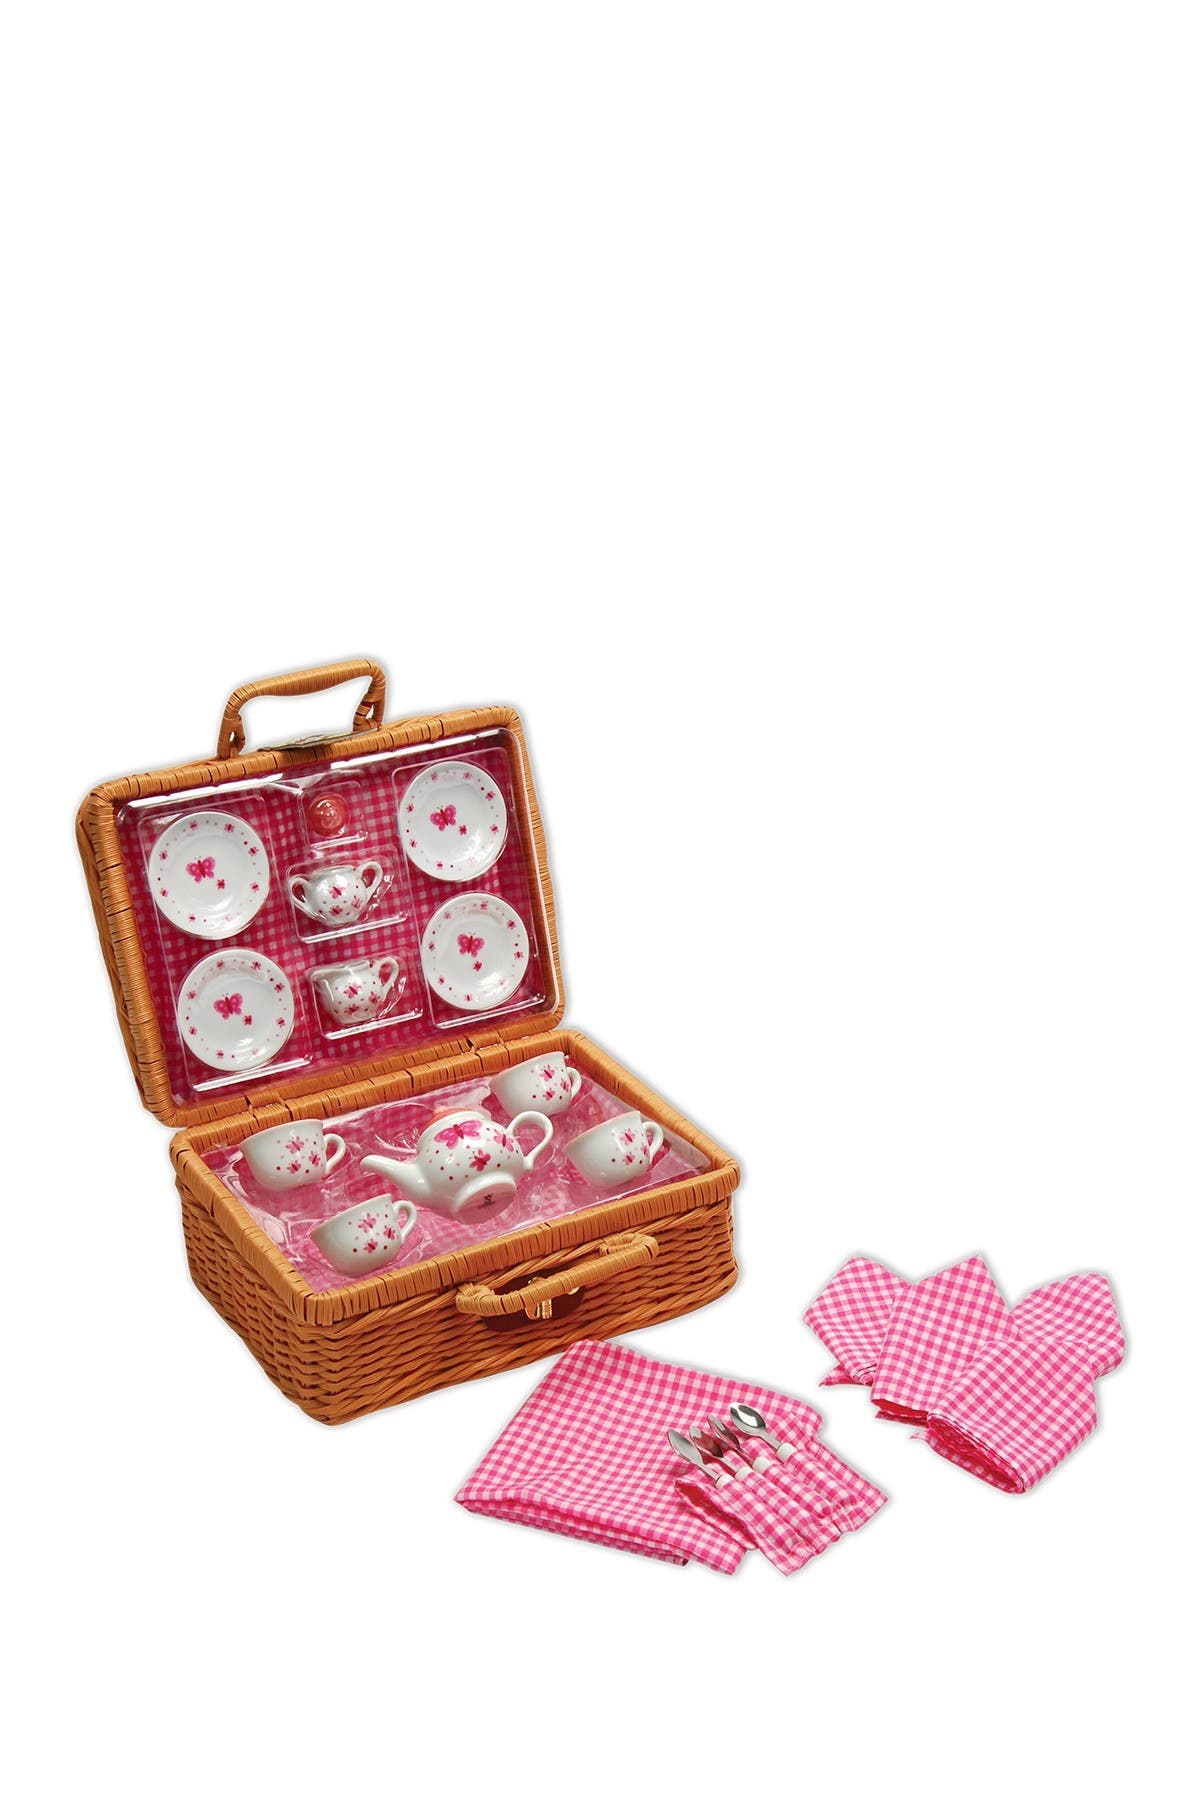 Image of Schylling Butterfly Tea Set Basket